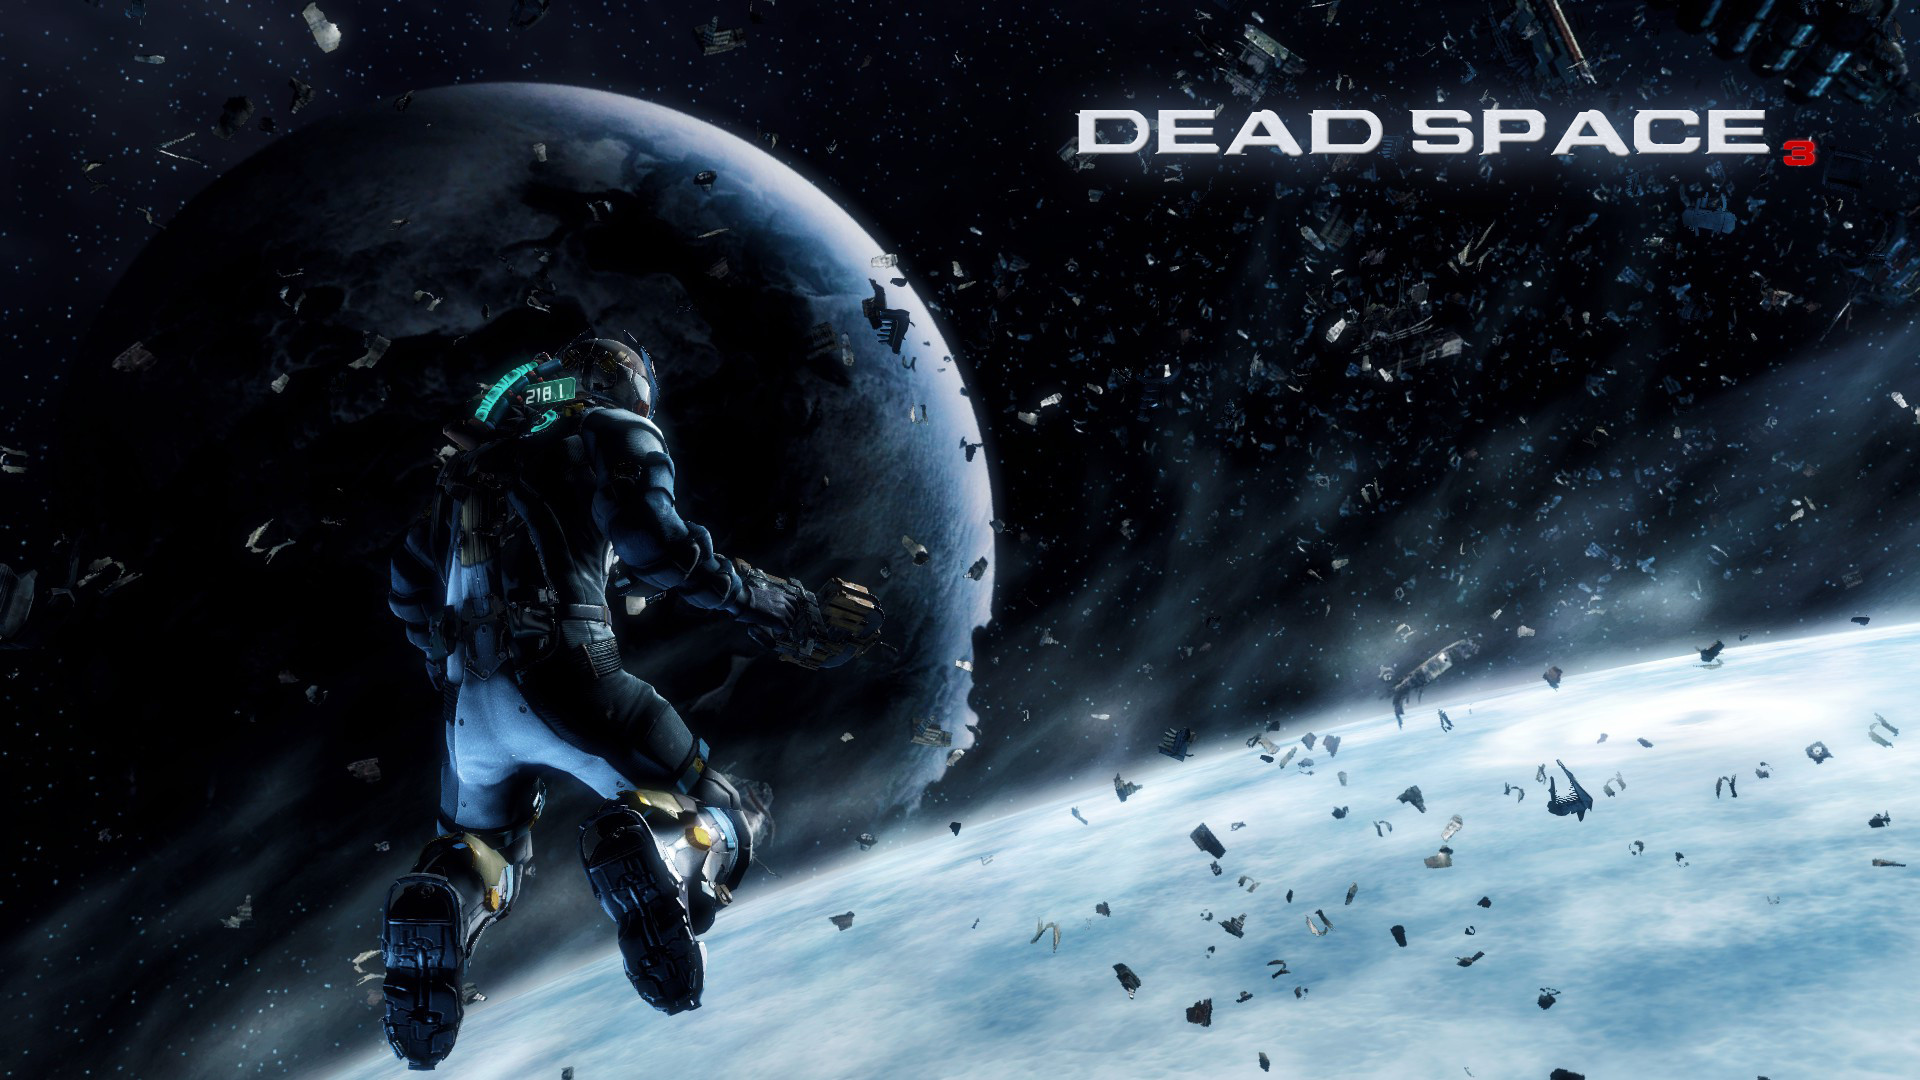 Dead space 3 wallpaper wallpapersafari - Dead space 3 wallpaper 1080p ...